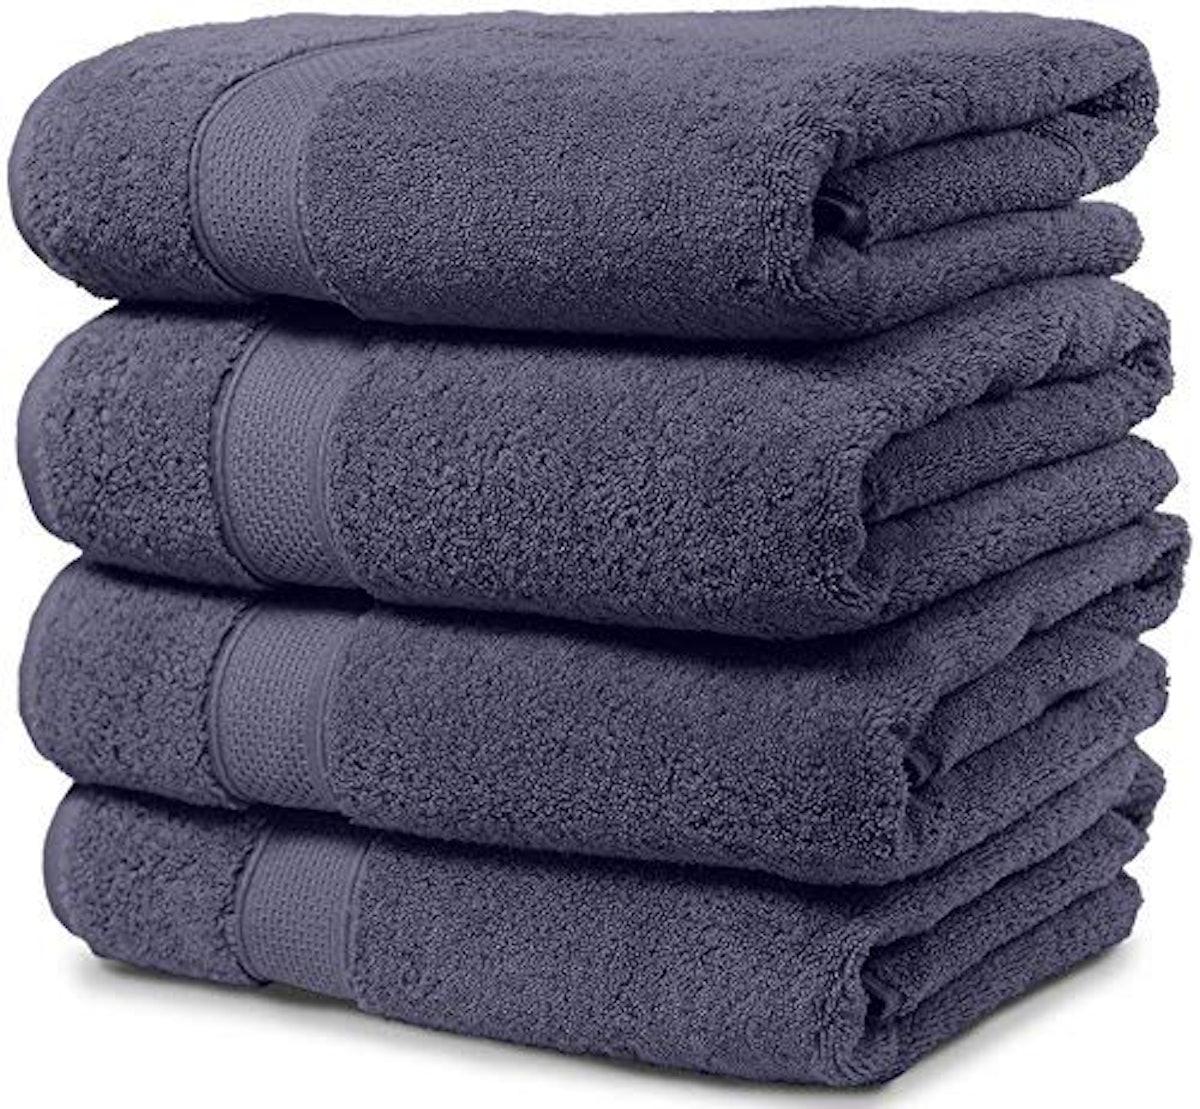 Maura Bath Towel Set (4-Pack)